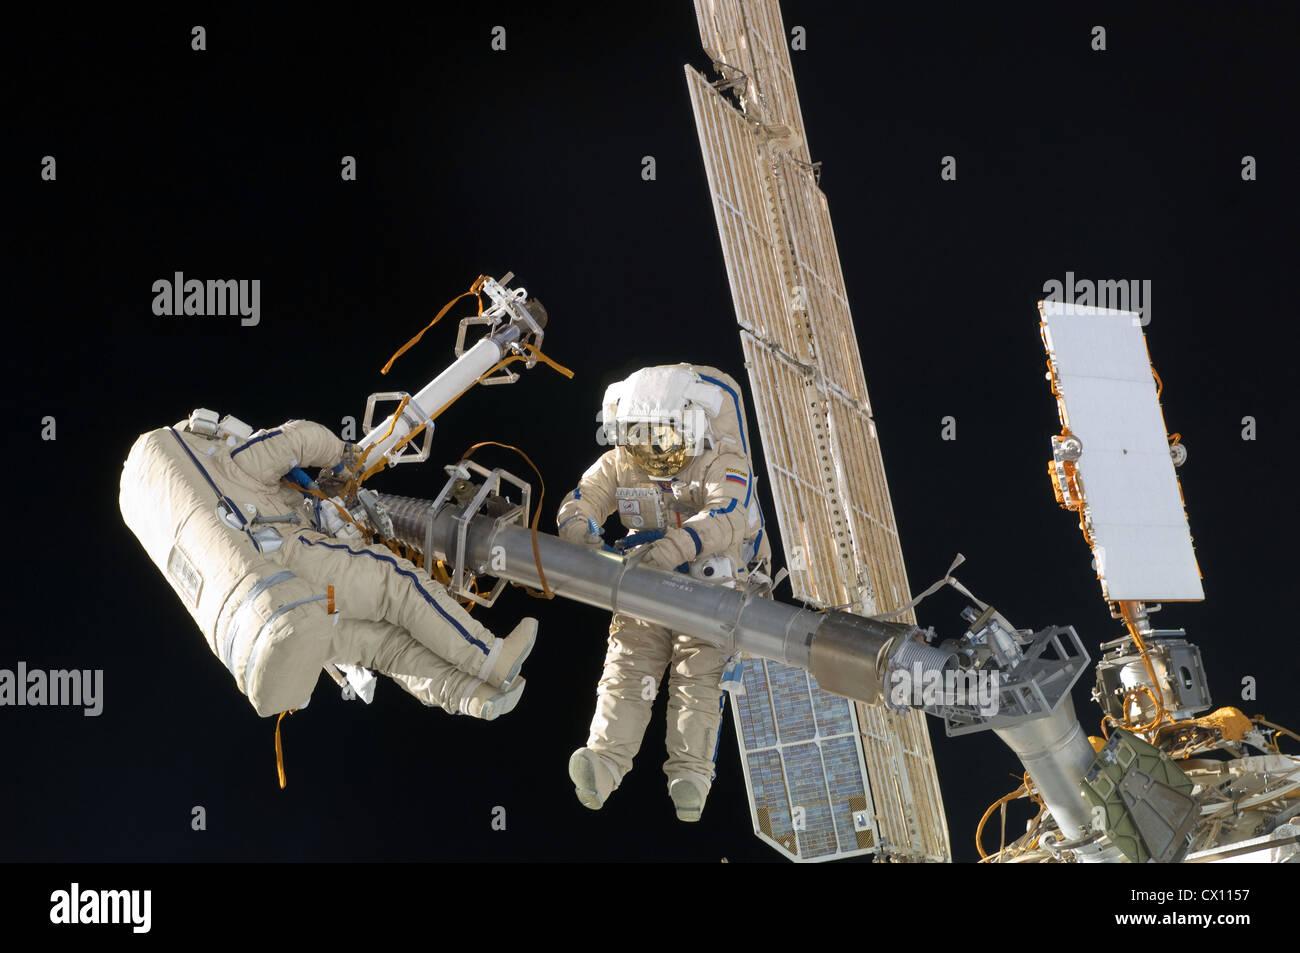 Russian cosmonauts Oleg Kononenko and Anton Shkaplerov, both Expedition 30 flight engineers during a spacewalk - Stock Image